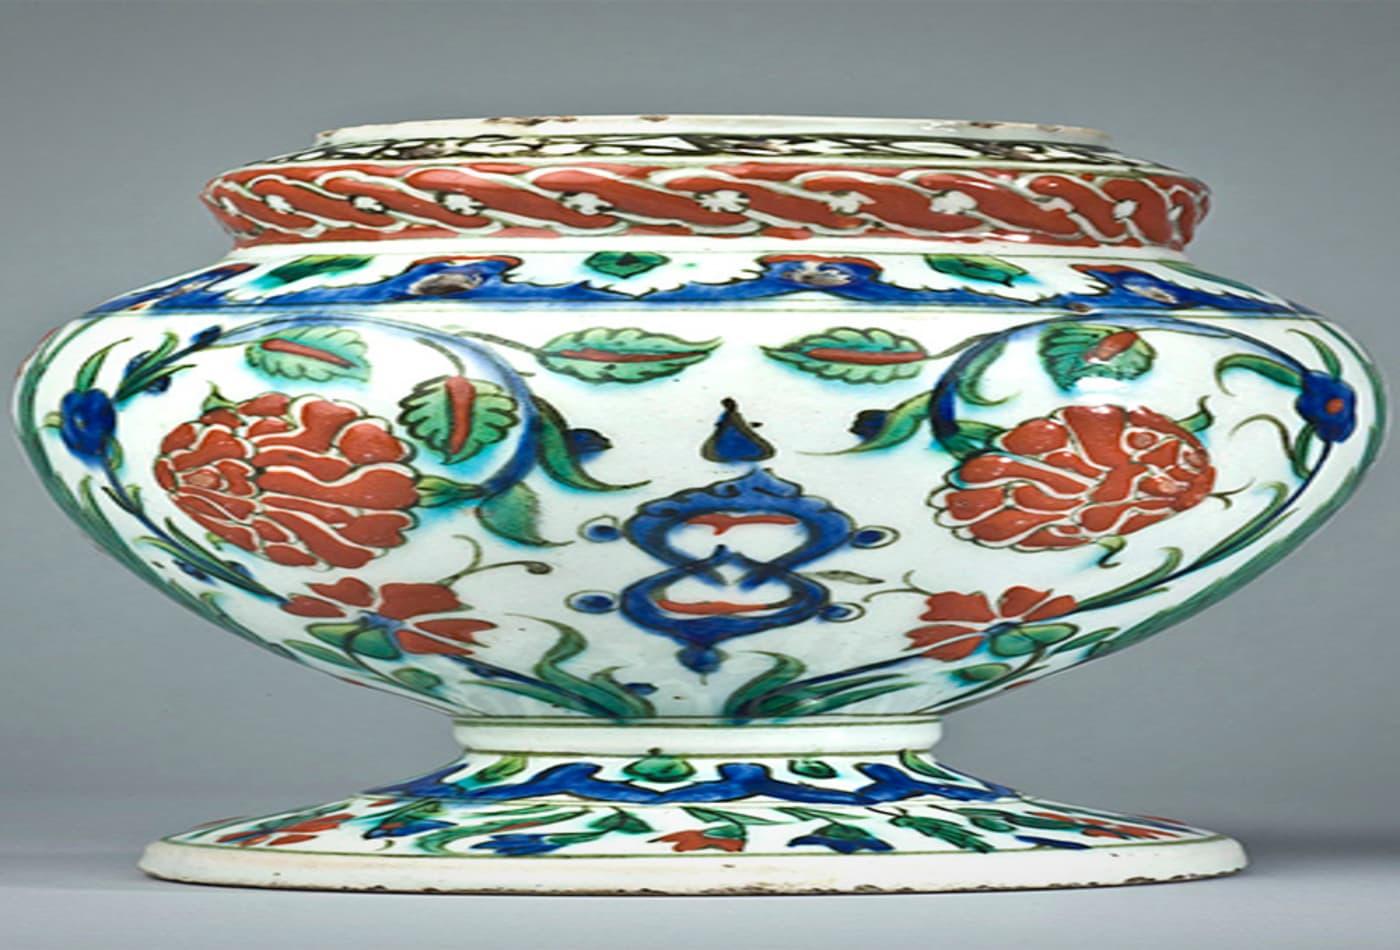 48743542 Investing-in-turkish-treaures-flower-vase.jpg